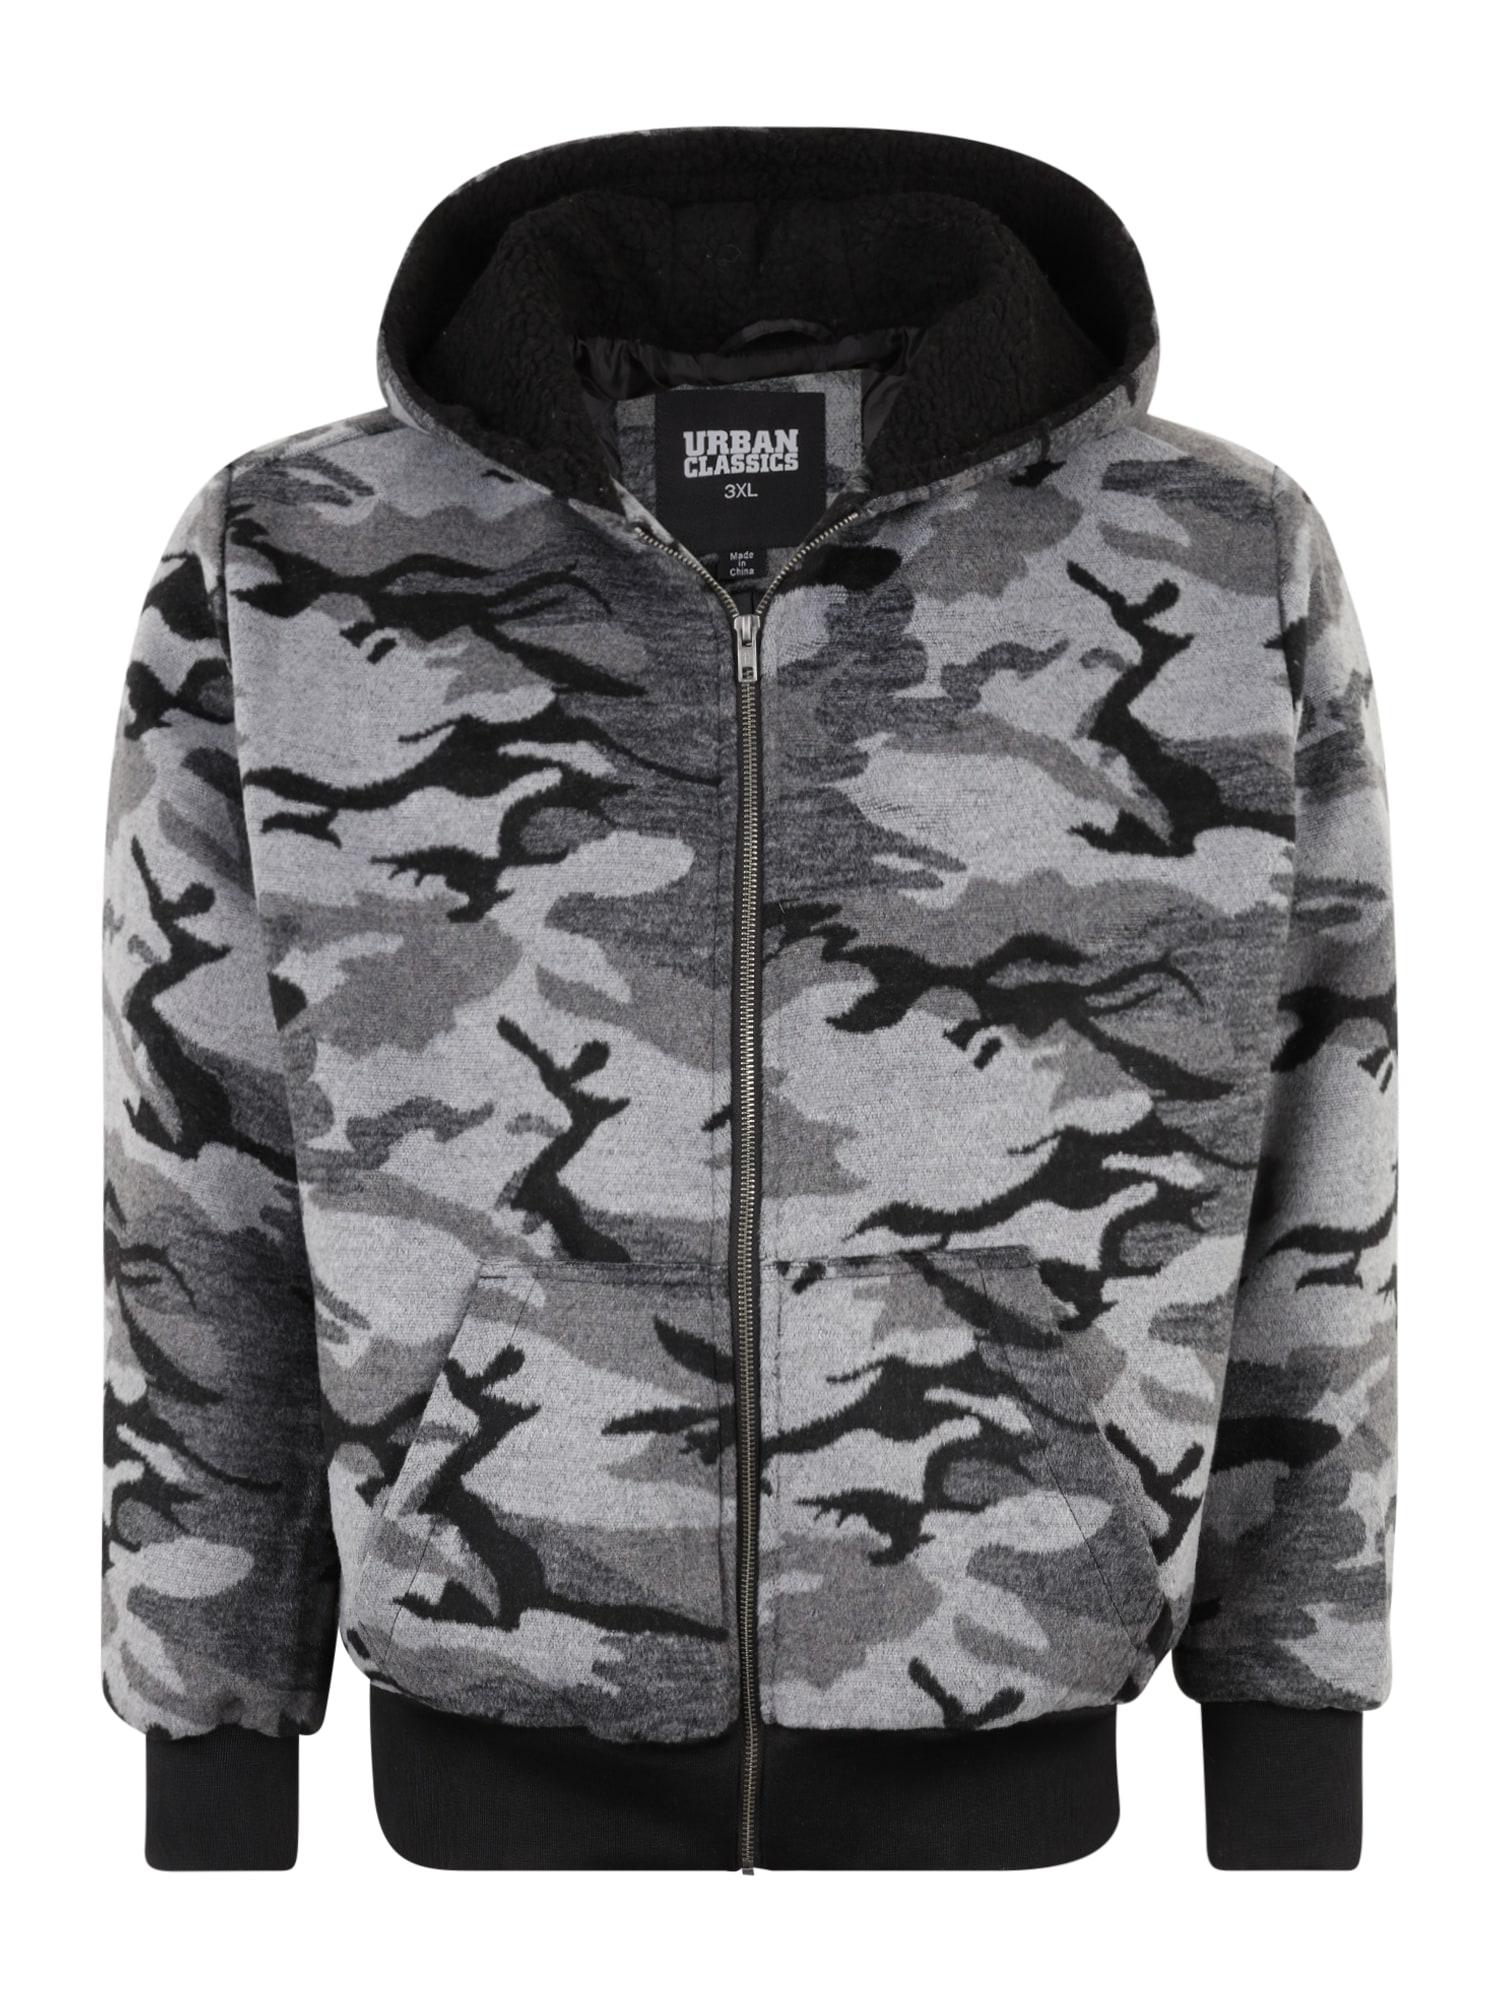 Urban Classics Big & Tall Džemperis šviesiai pilka / bazalto pilka / juoda / tamsiai pilka